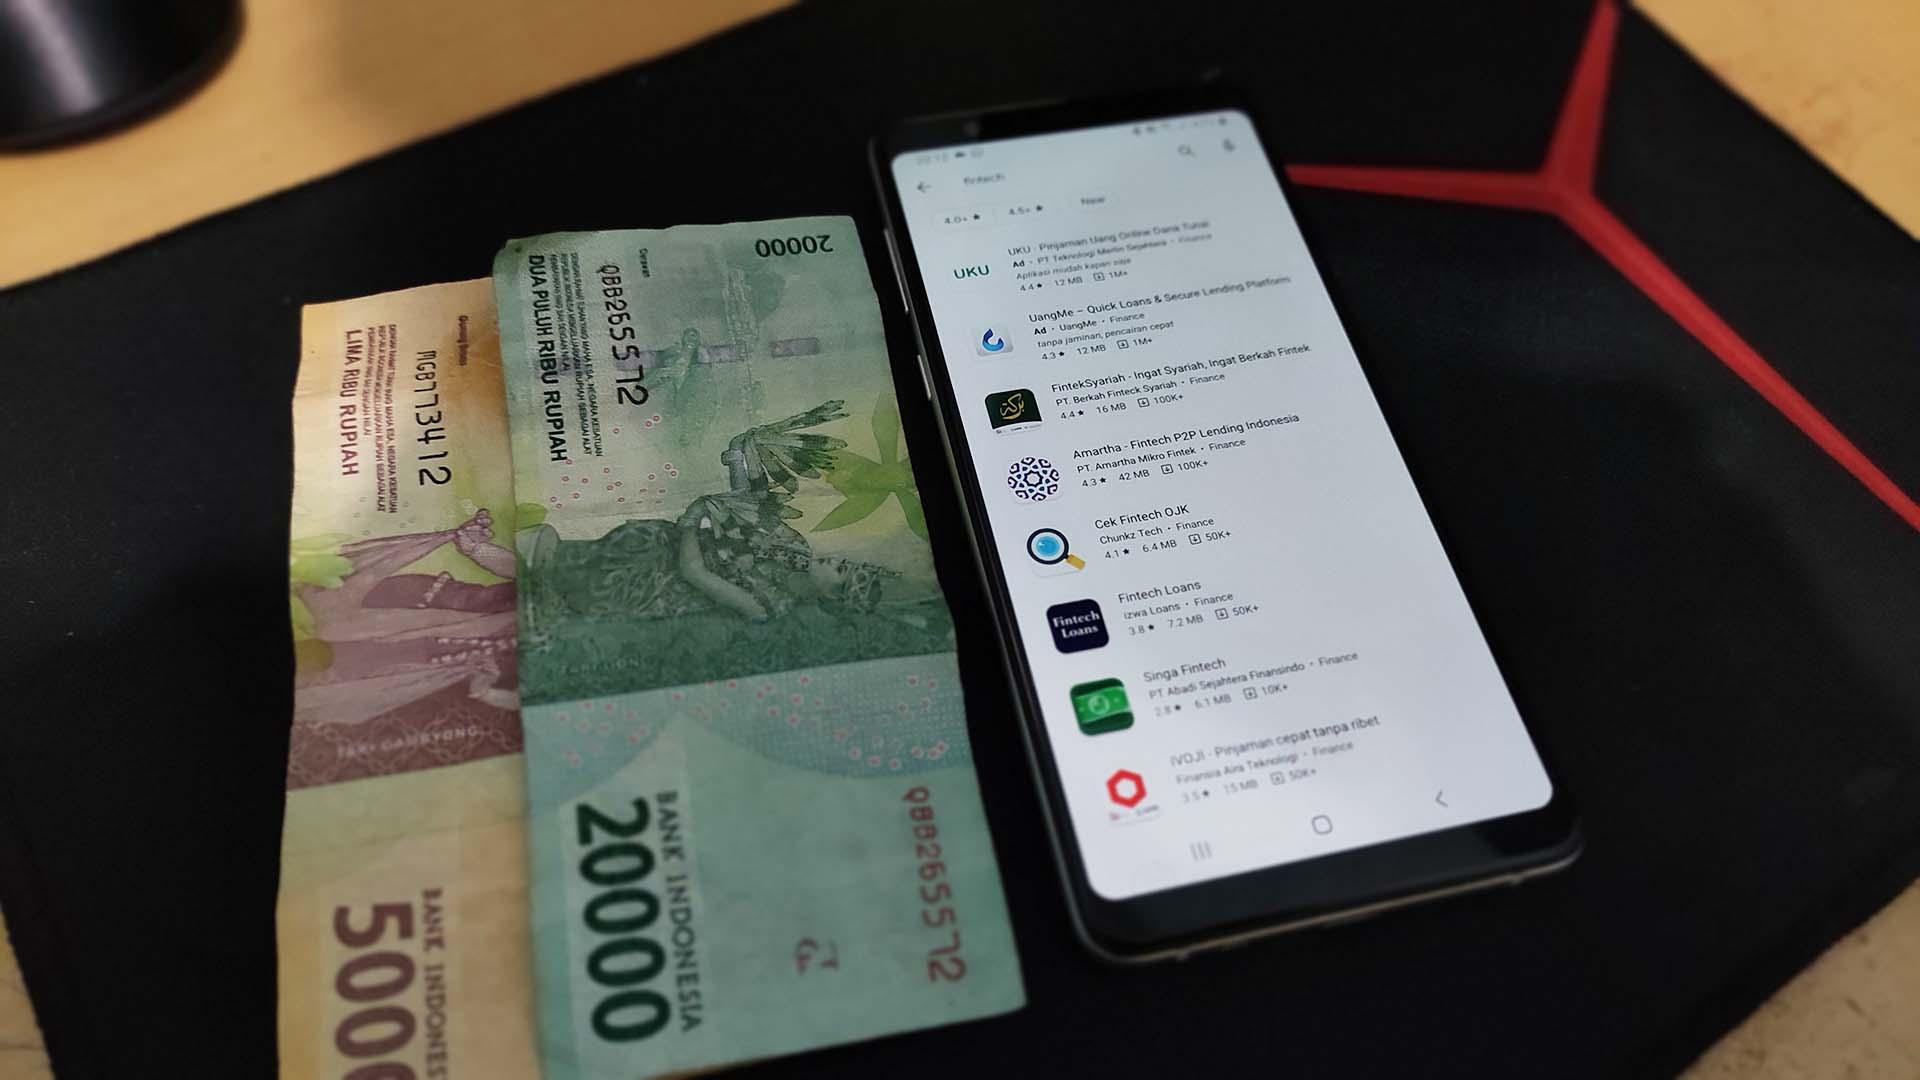 Pinjaman Online Terdaftar Di Ojk September 2020 Update Techbiz